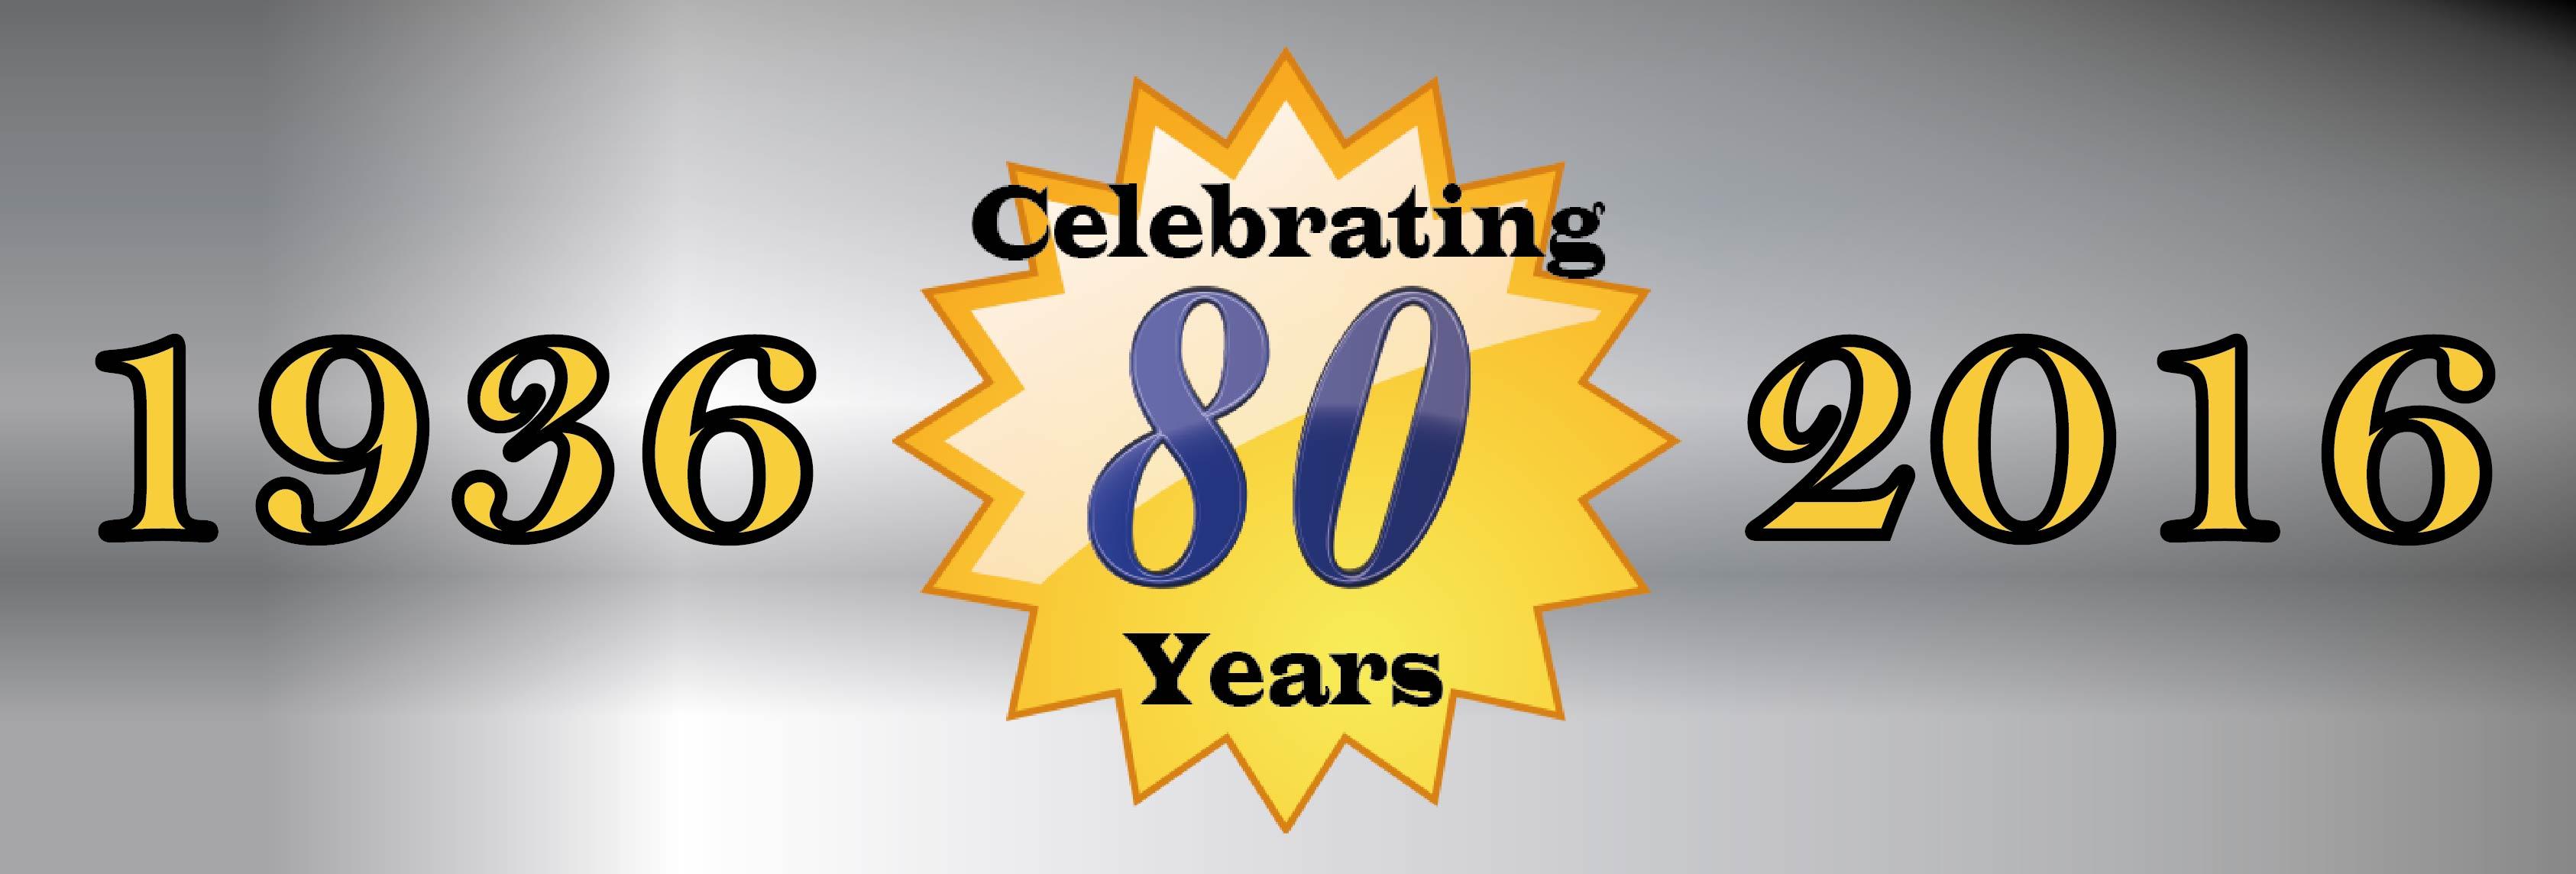 80 Years